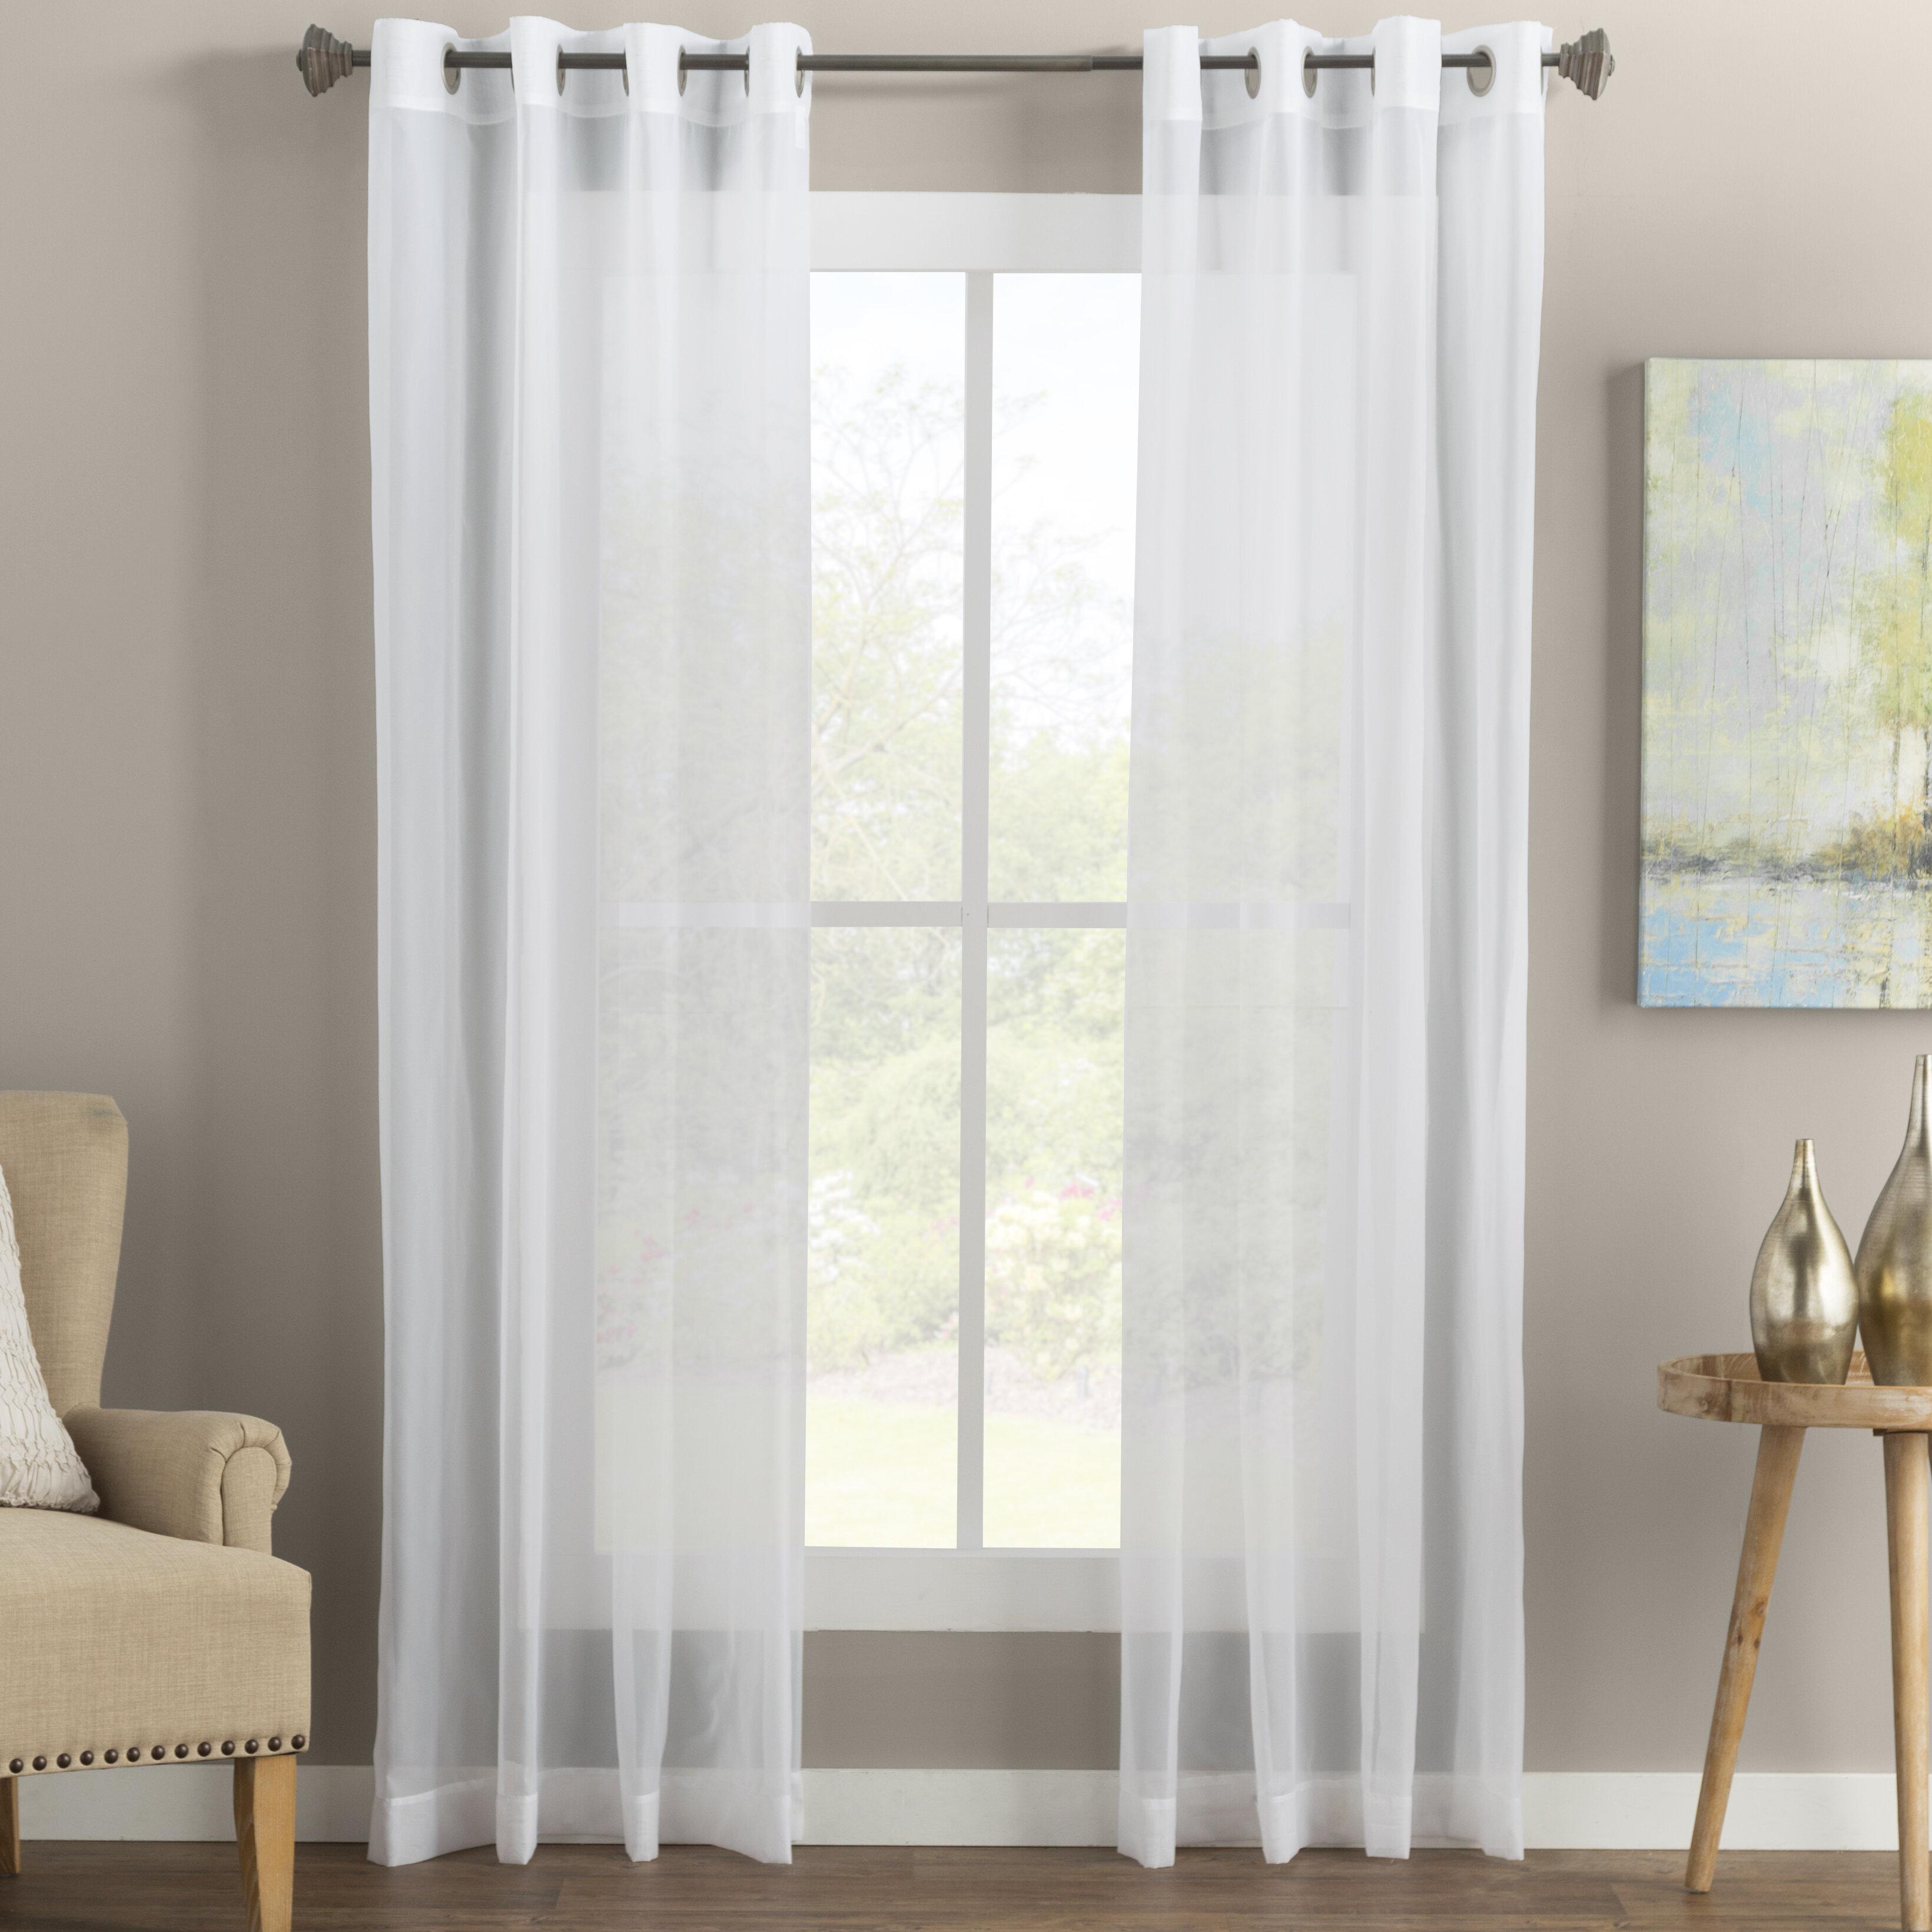 Wayfair Basics Solid Sheer Grommet Single Curtain Panel